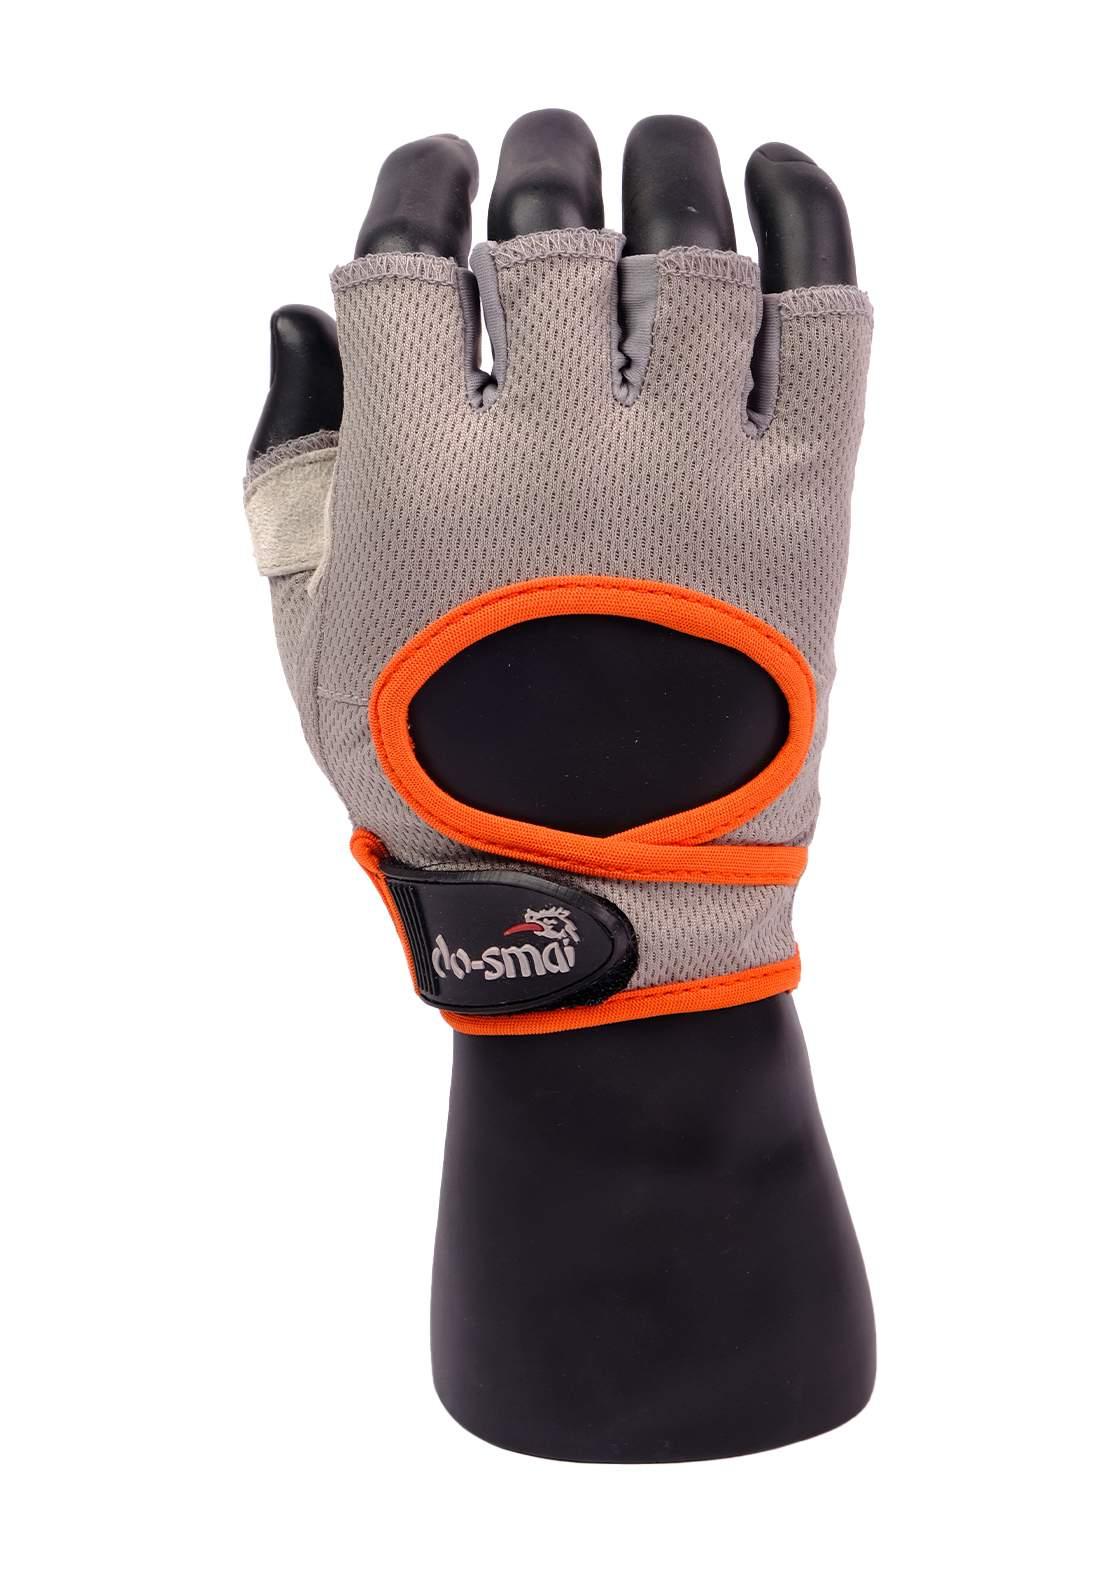 Do-Samai Glove قفازات رياضية